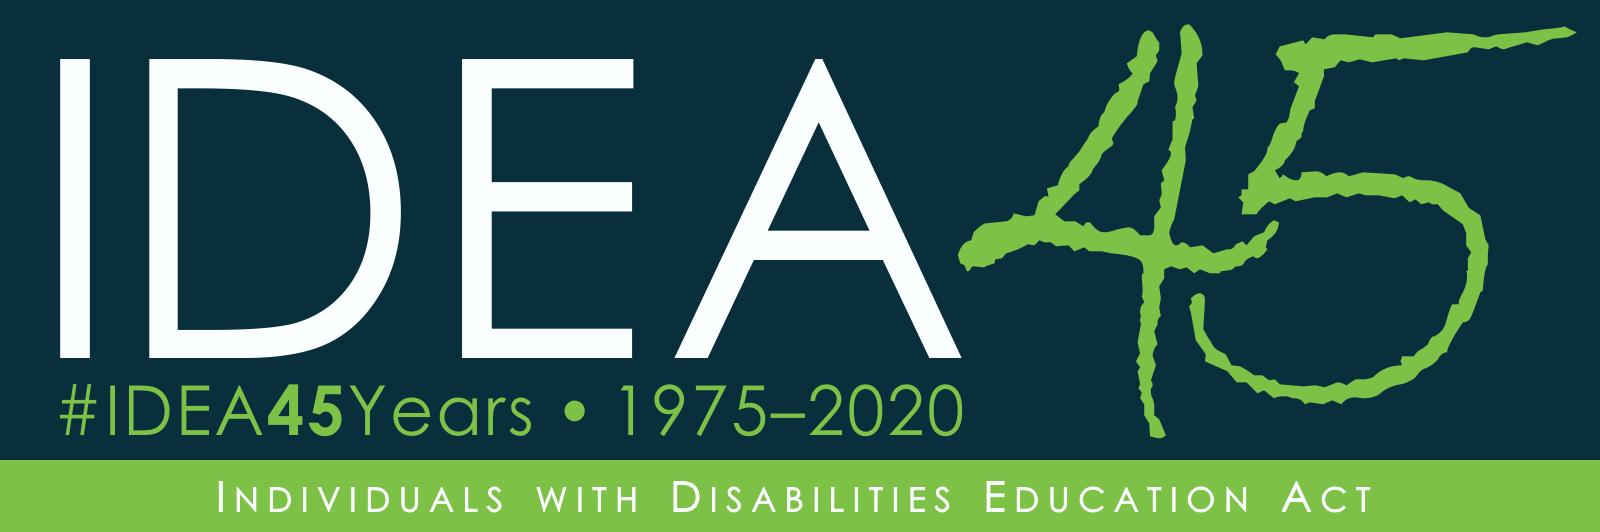 IDEA-45 logo. IDEA 45. #IDEA45 Years. 1975-2020. Individuals With Disabilities Education Act.